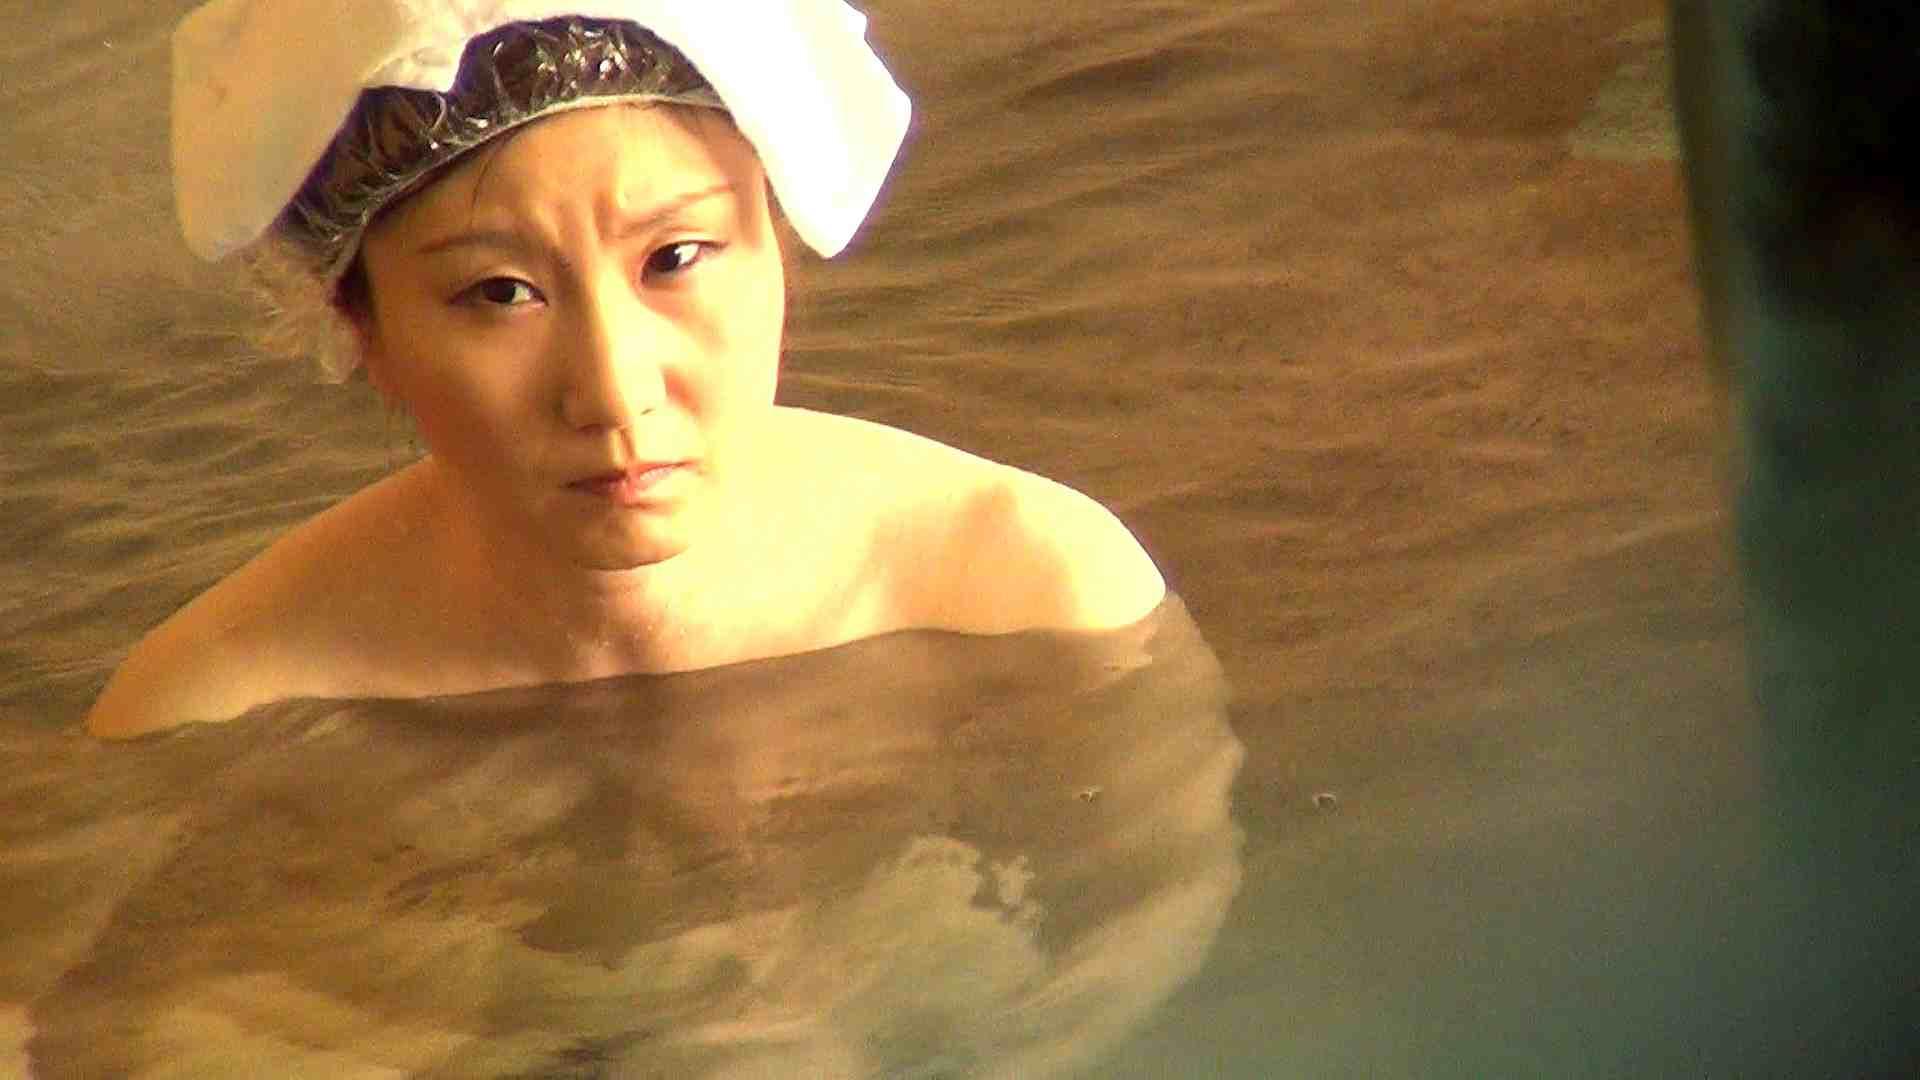 Aquaな露天風呂Vol.278 OLセックス 覗きオメコ動画キャプチャ 100画像 56